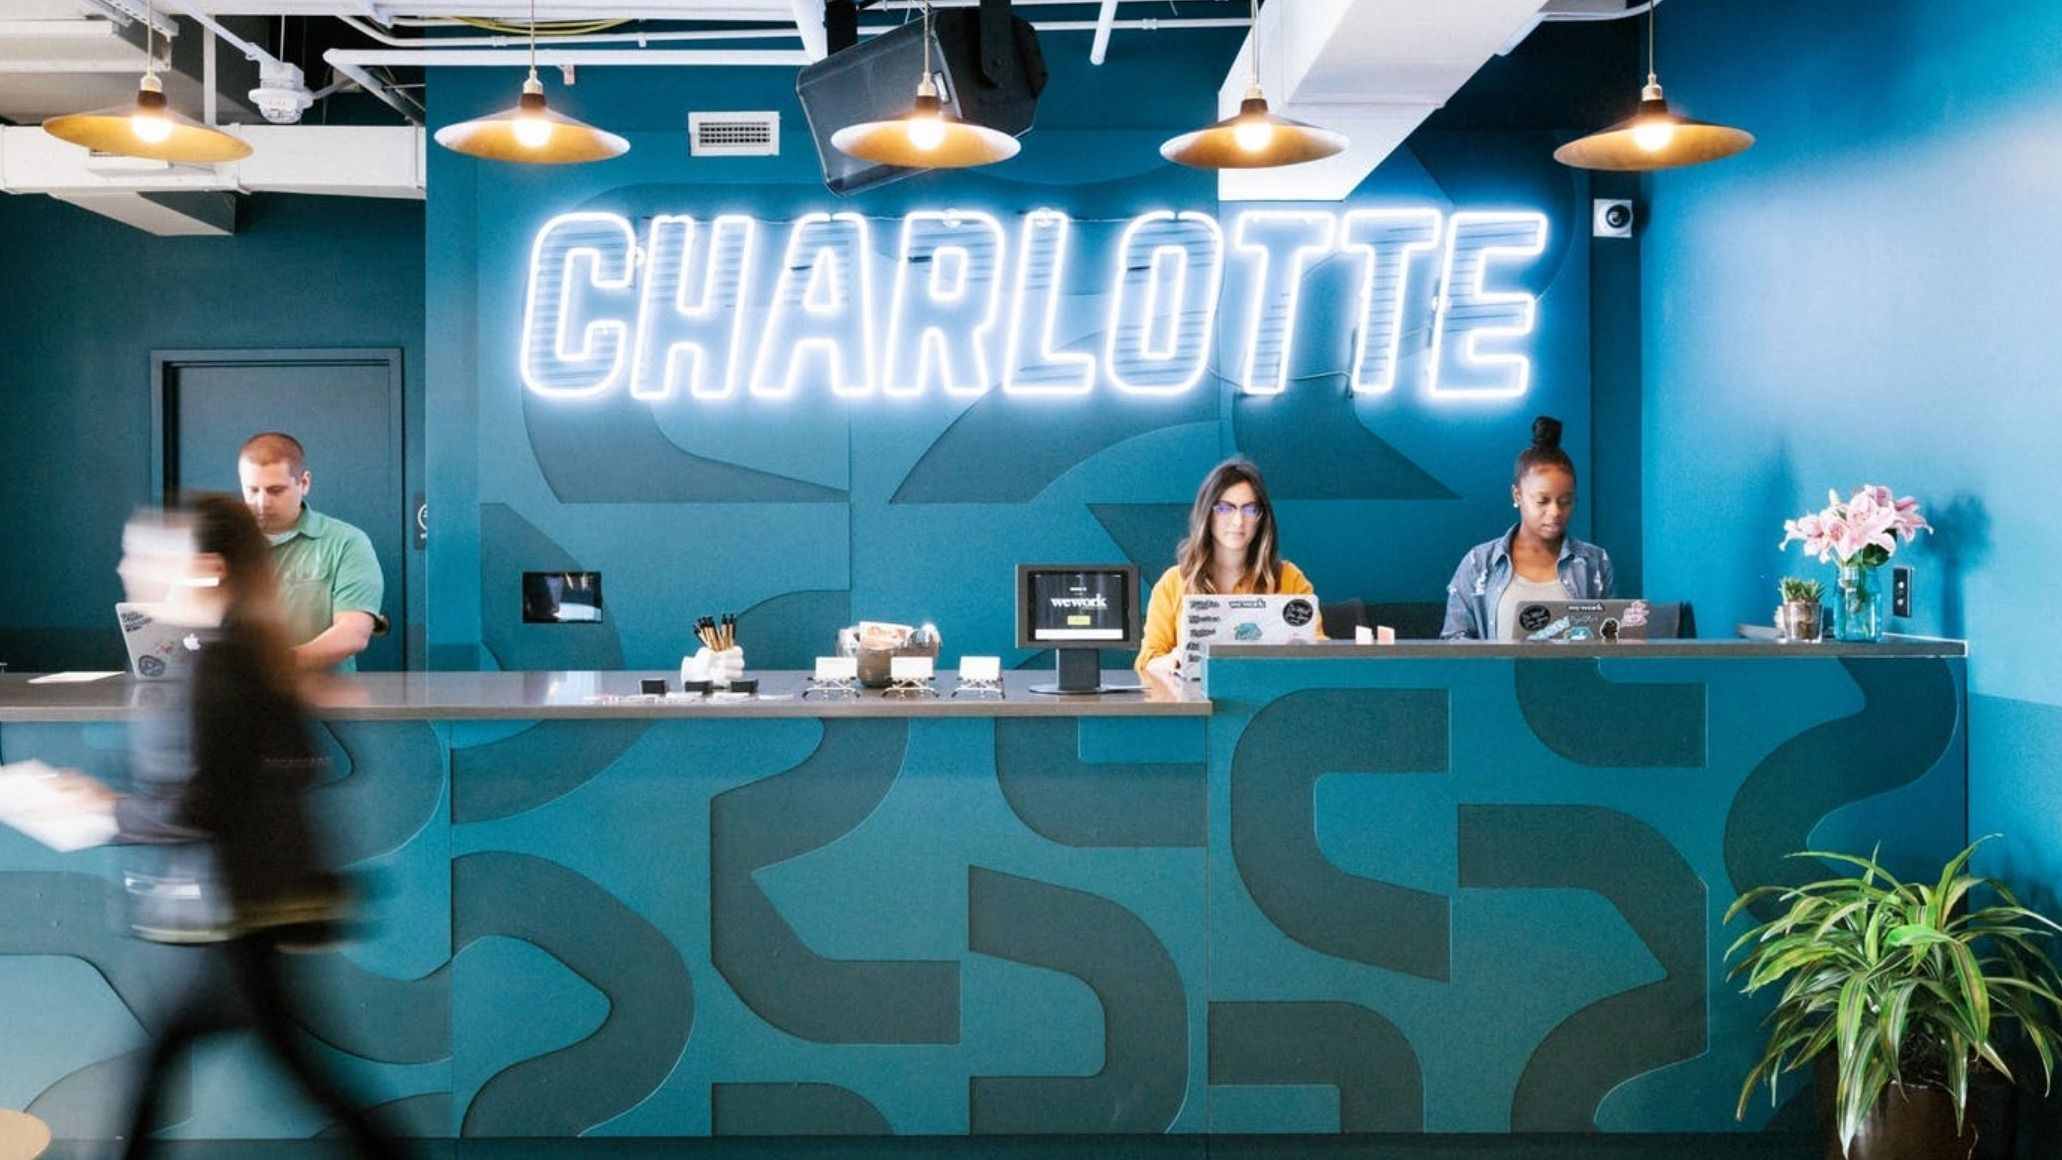 The Charlotte NC Digital Marketing Meetup Group